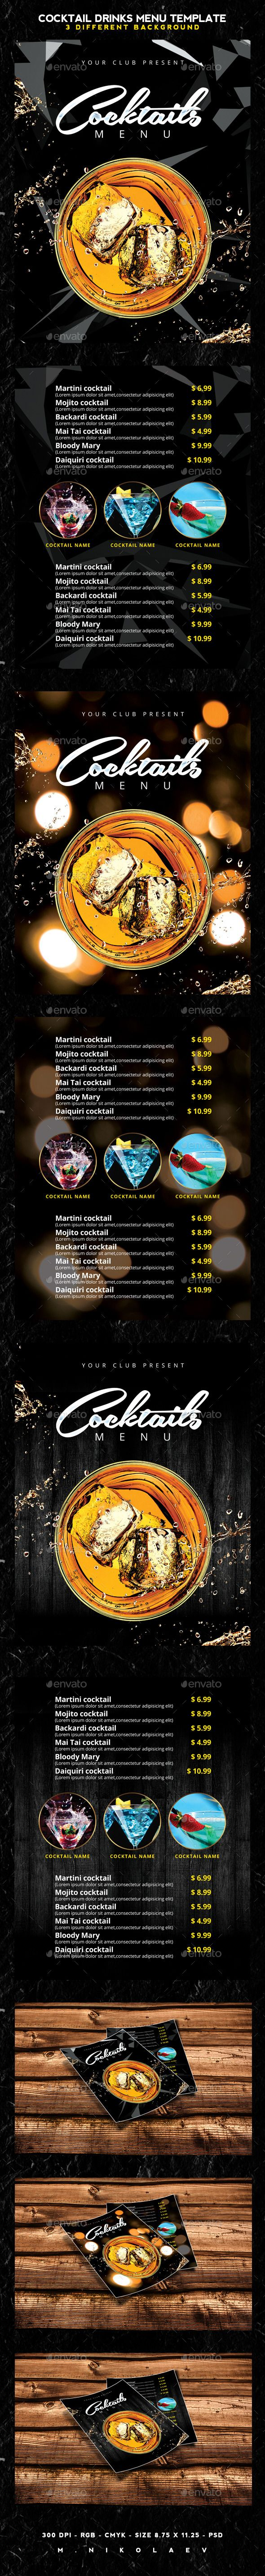 Cocktail Drinks Menu Template #design #alimentationmenu Download: http://graphicriver.net/item/cocktail-drinks-menu/12253324?ref=ksioks